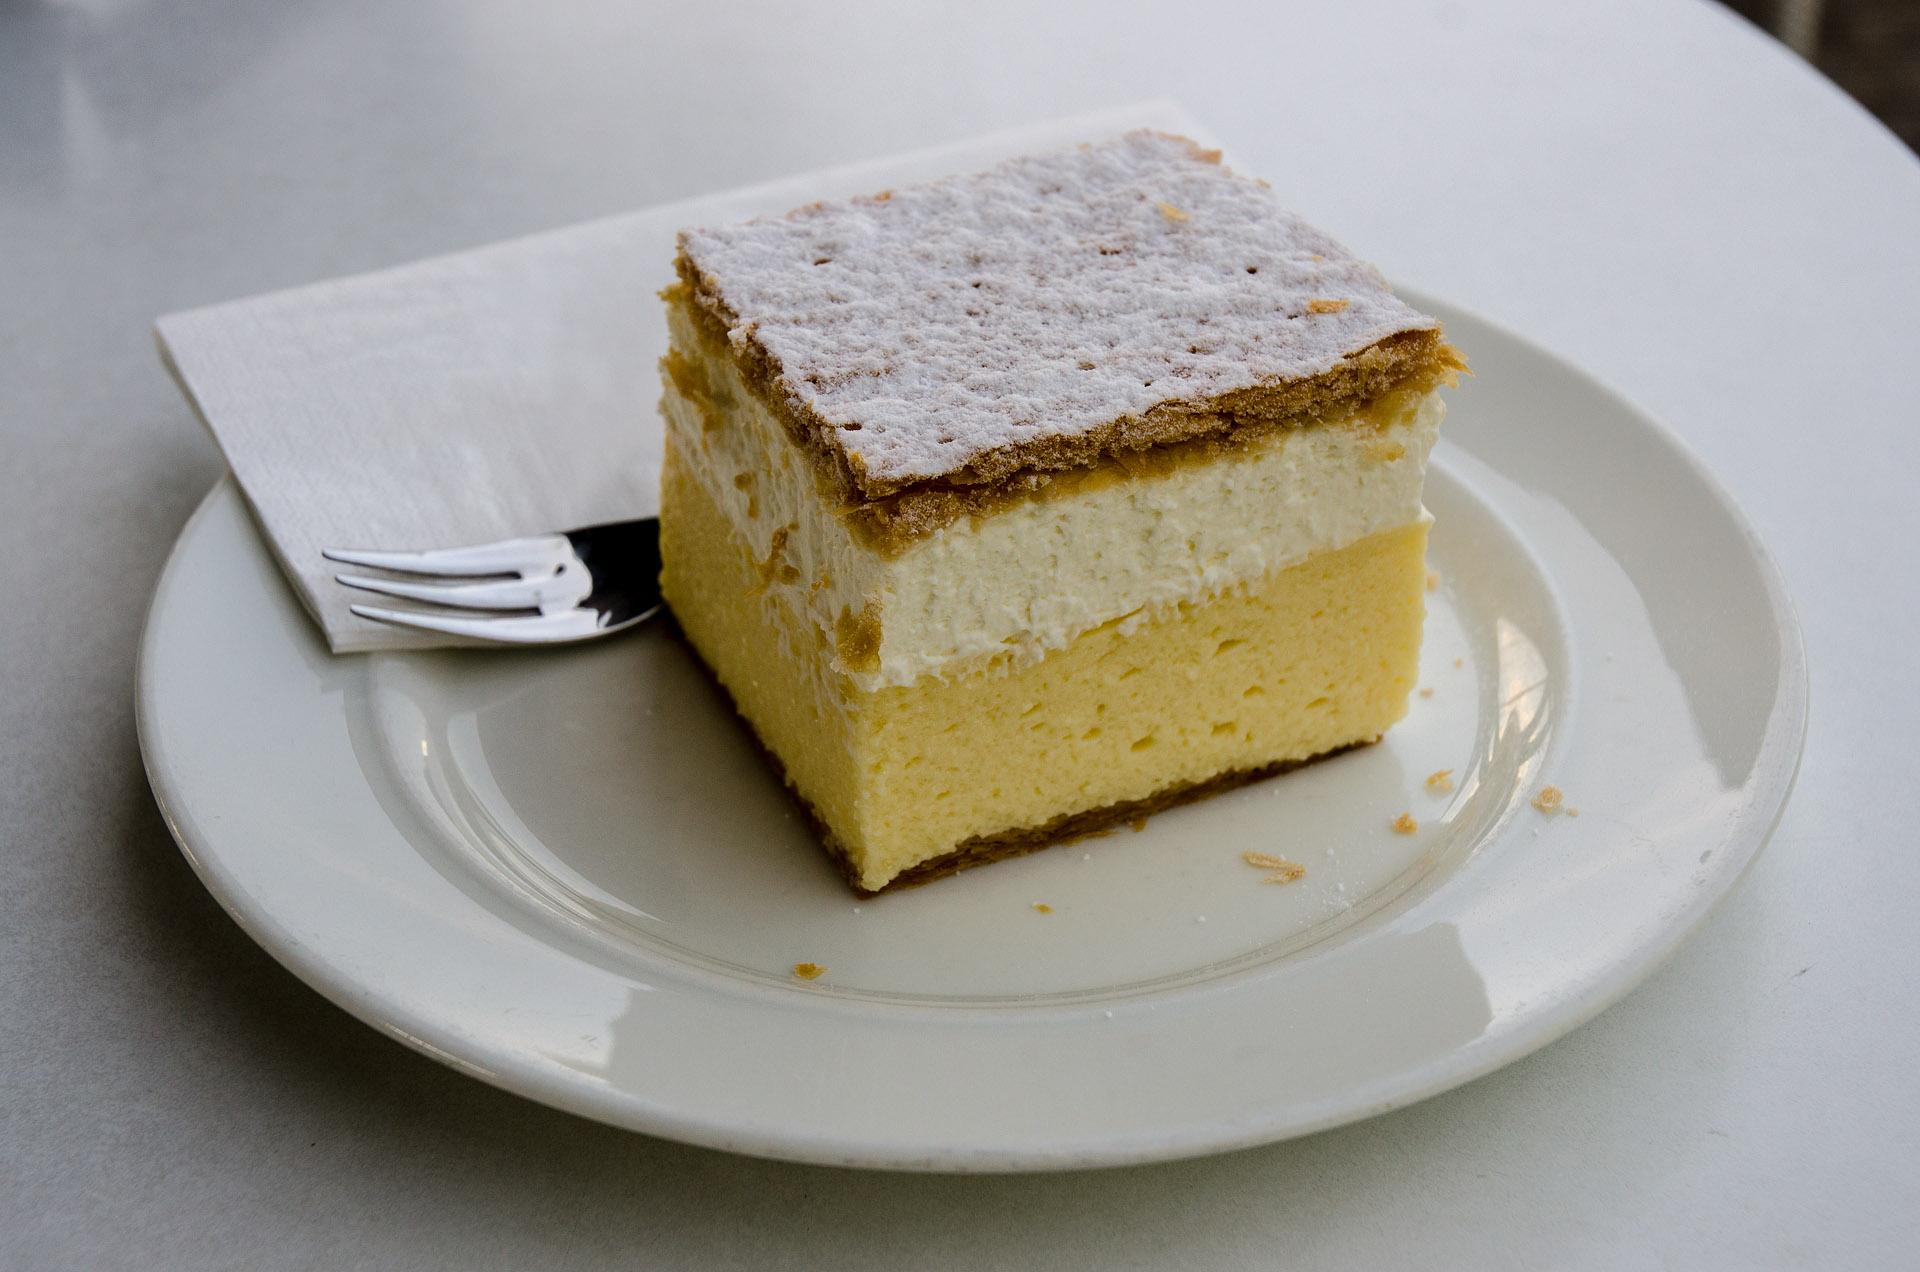 Bled cream cake (kremna rezina)